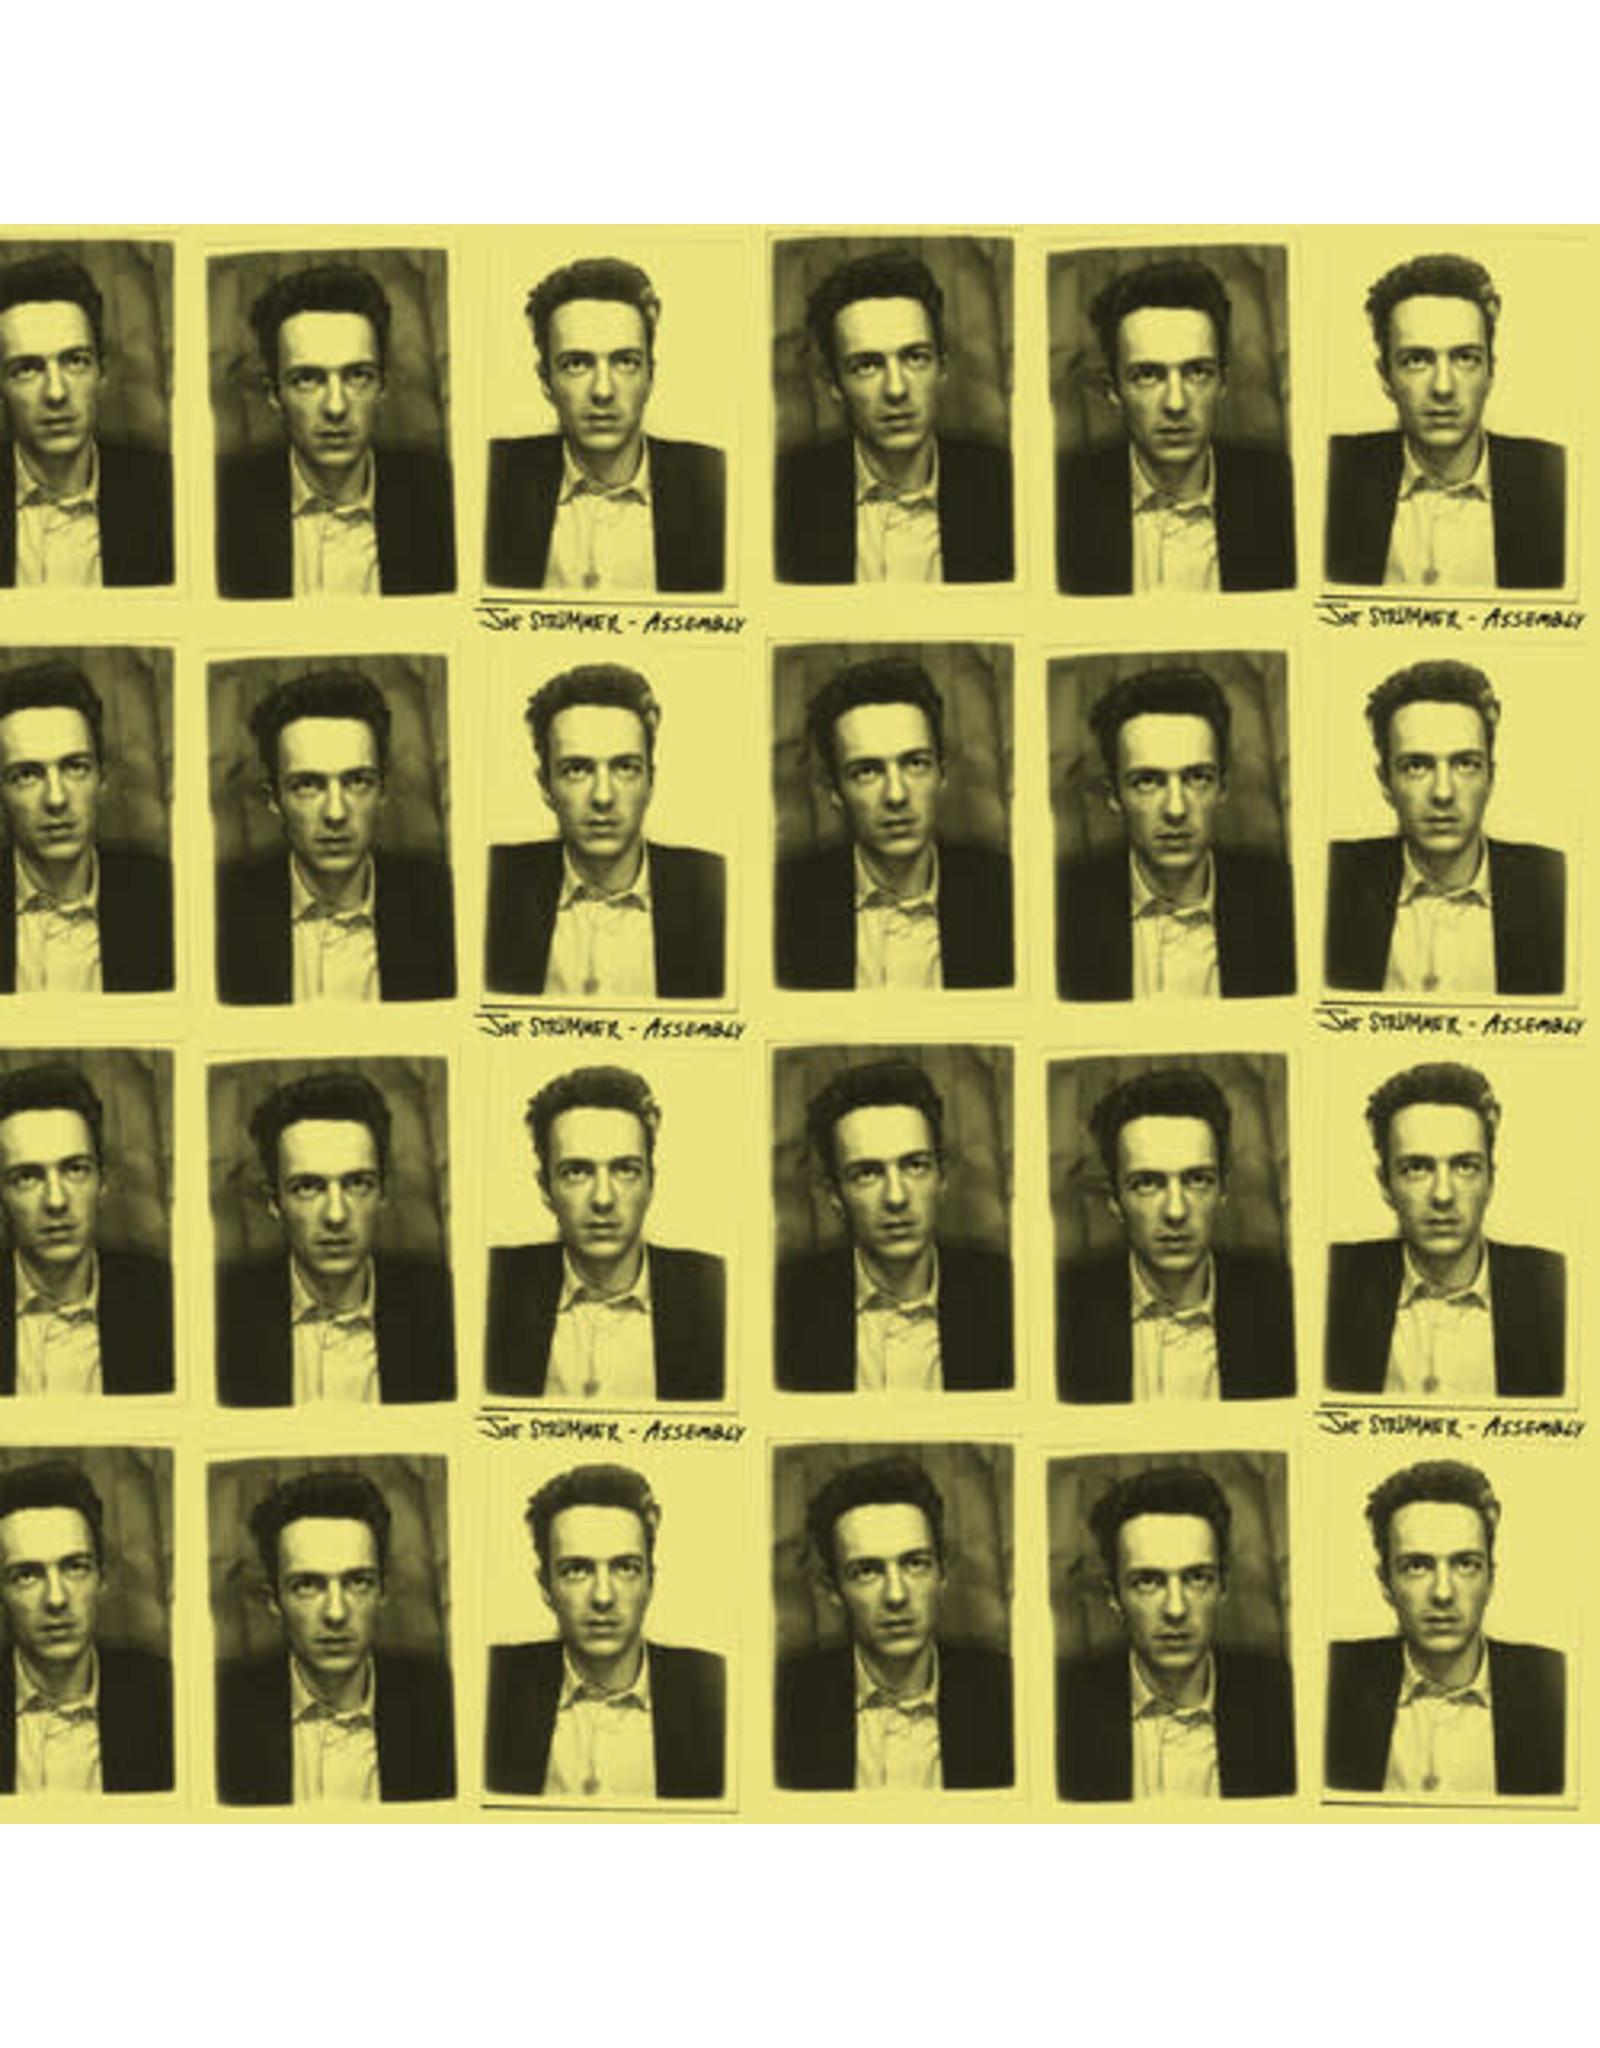 New Vinyl Joe Strummer - Assembly 2LP